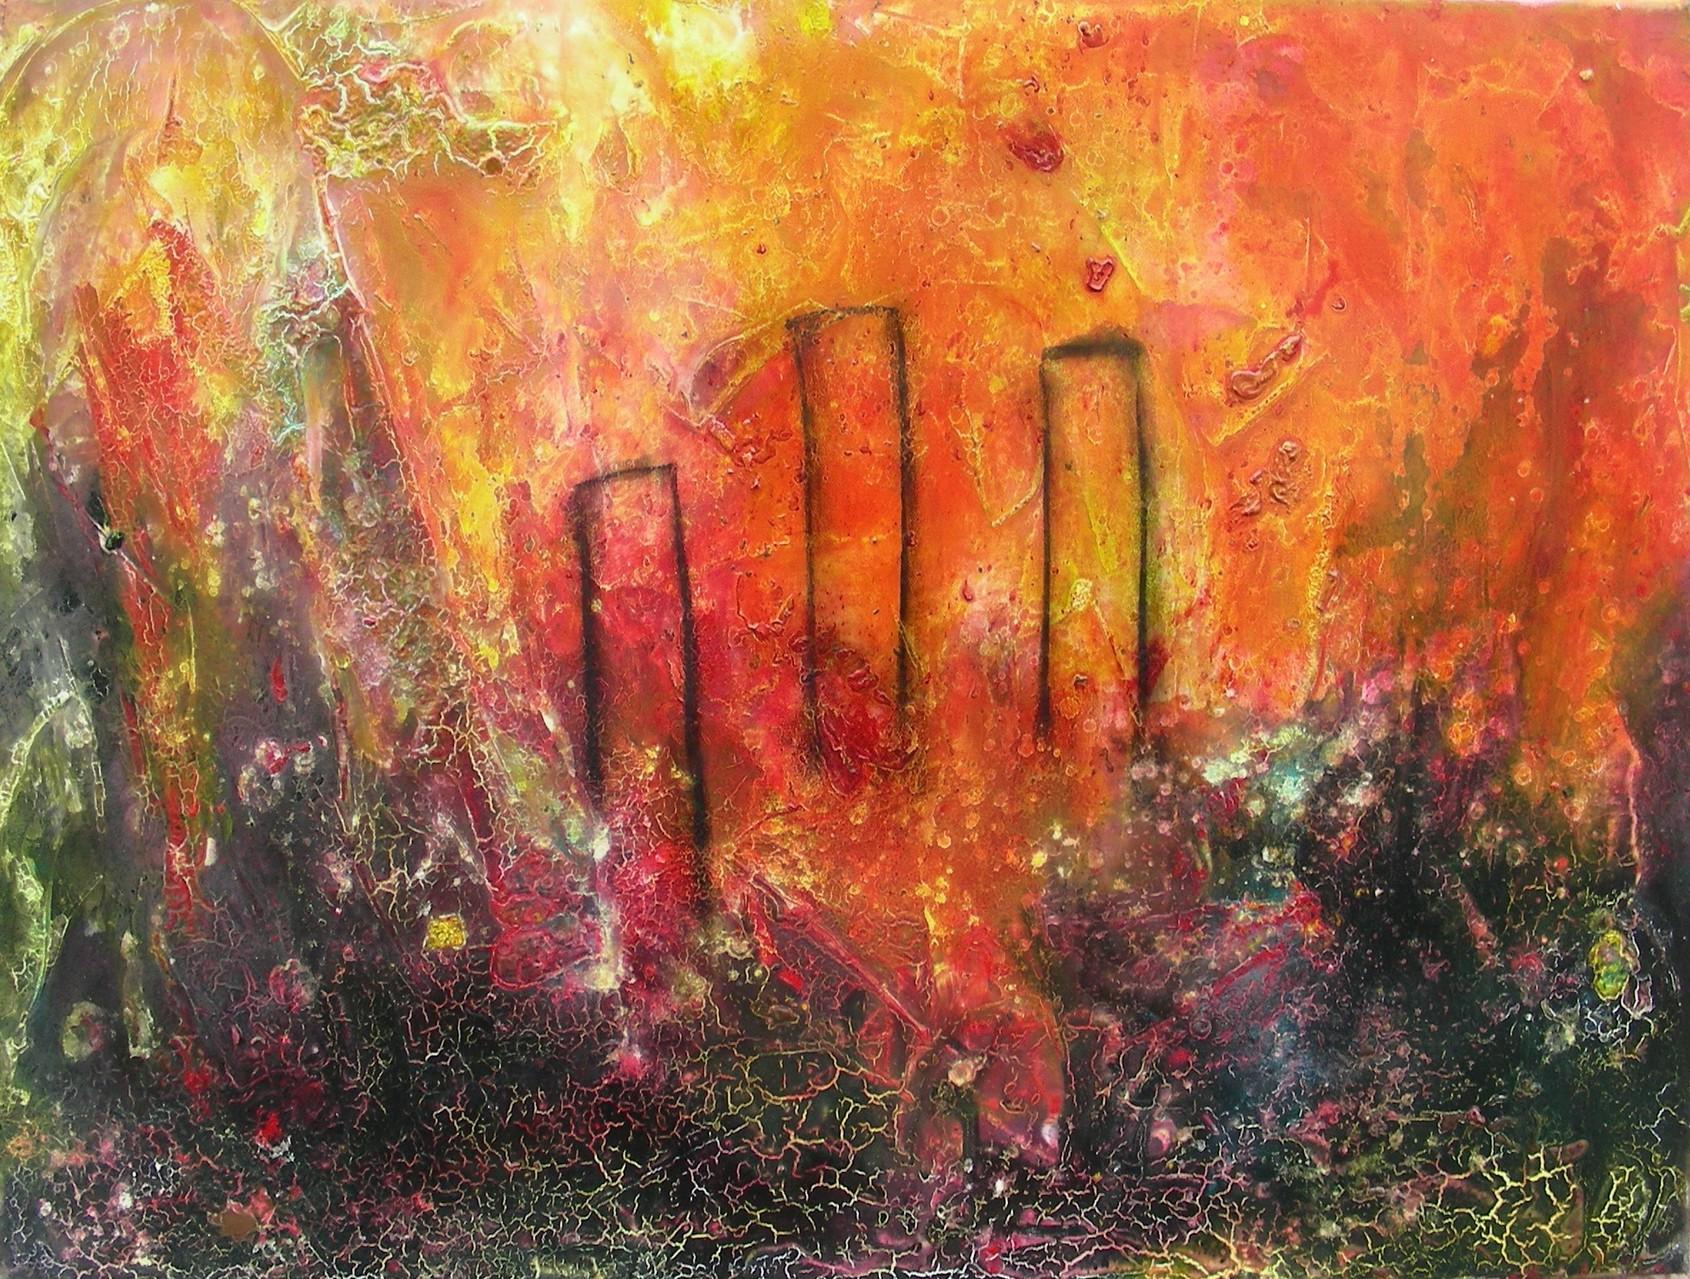 """Die drei Säulen"" III""  Acryl auf Leinwand 60x80x4cm"